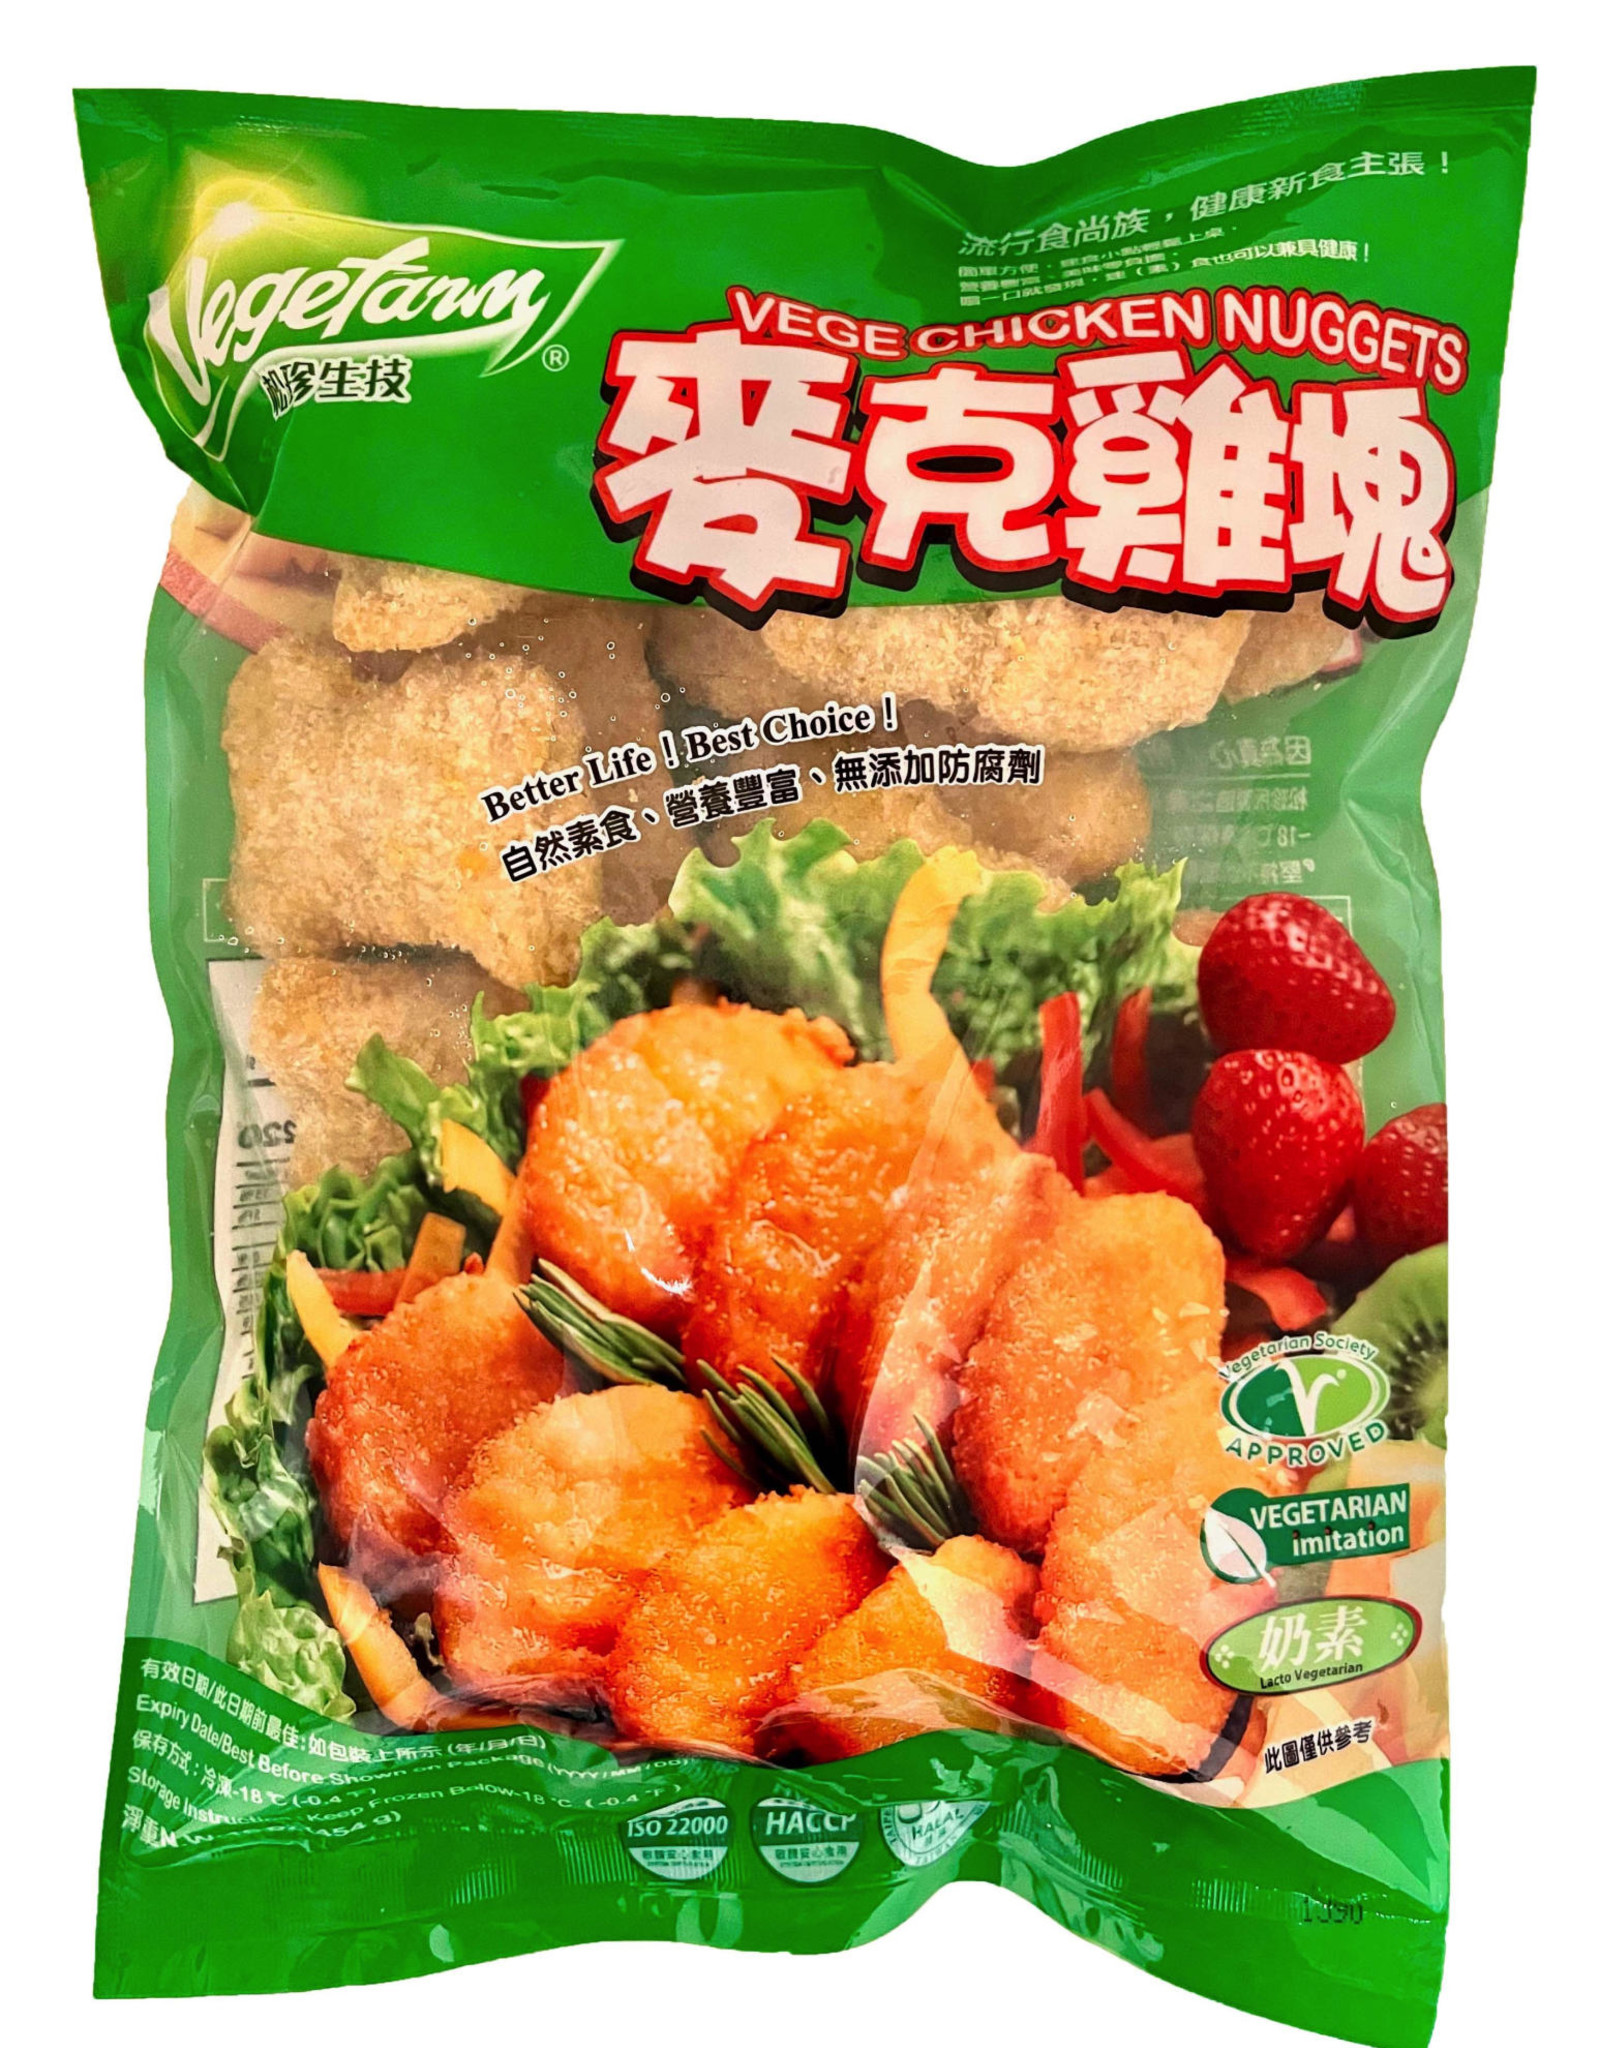 Vegefarm * 松珍 (VF) Vege Chicken Nuggets (S)*(松珍) 素麥克雞塊 (S)